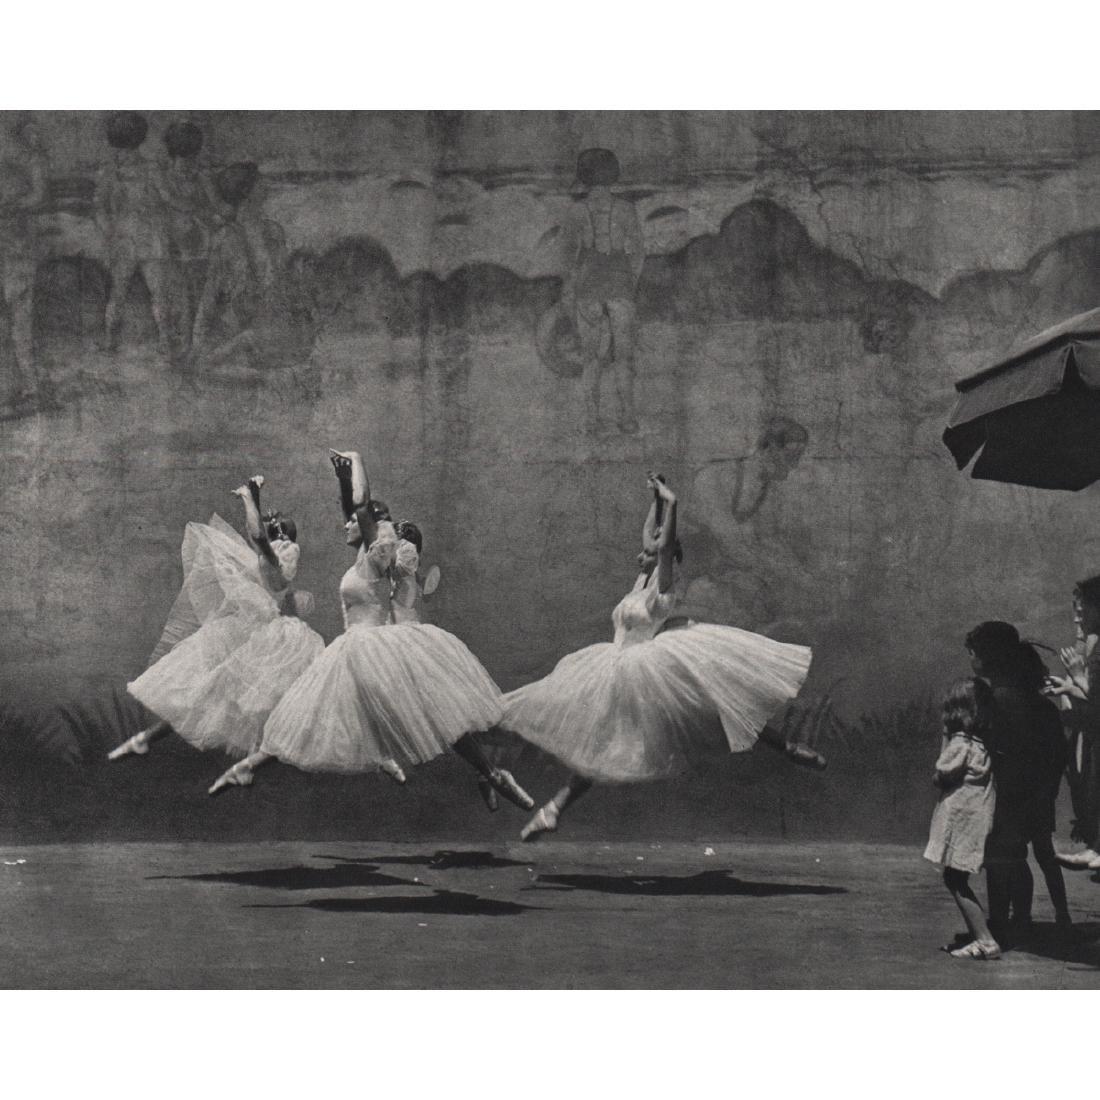 ANDRE KERTESZ - Ballet, New York, 1938